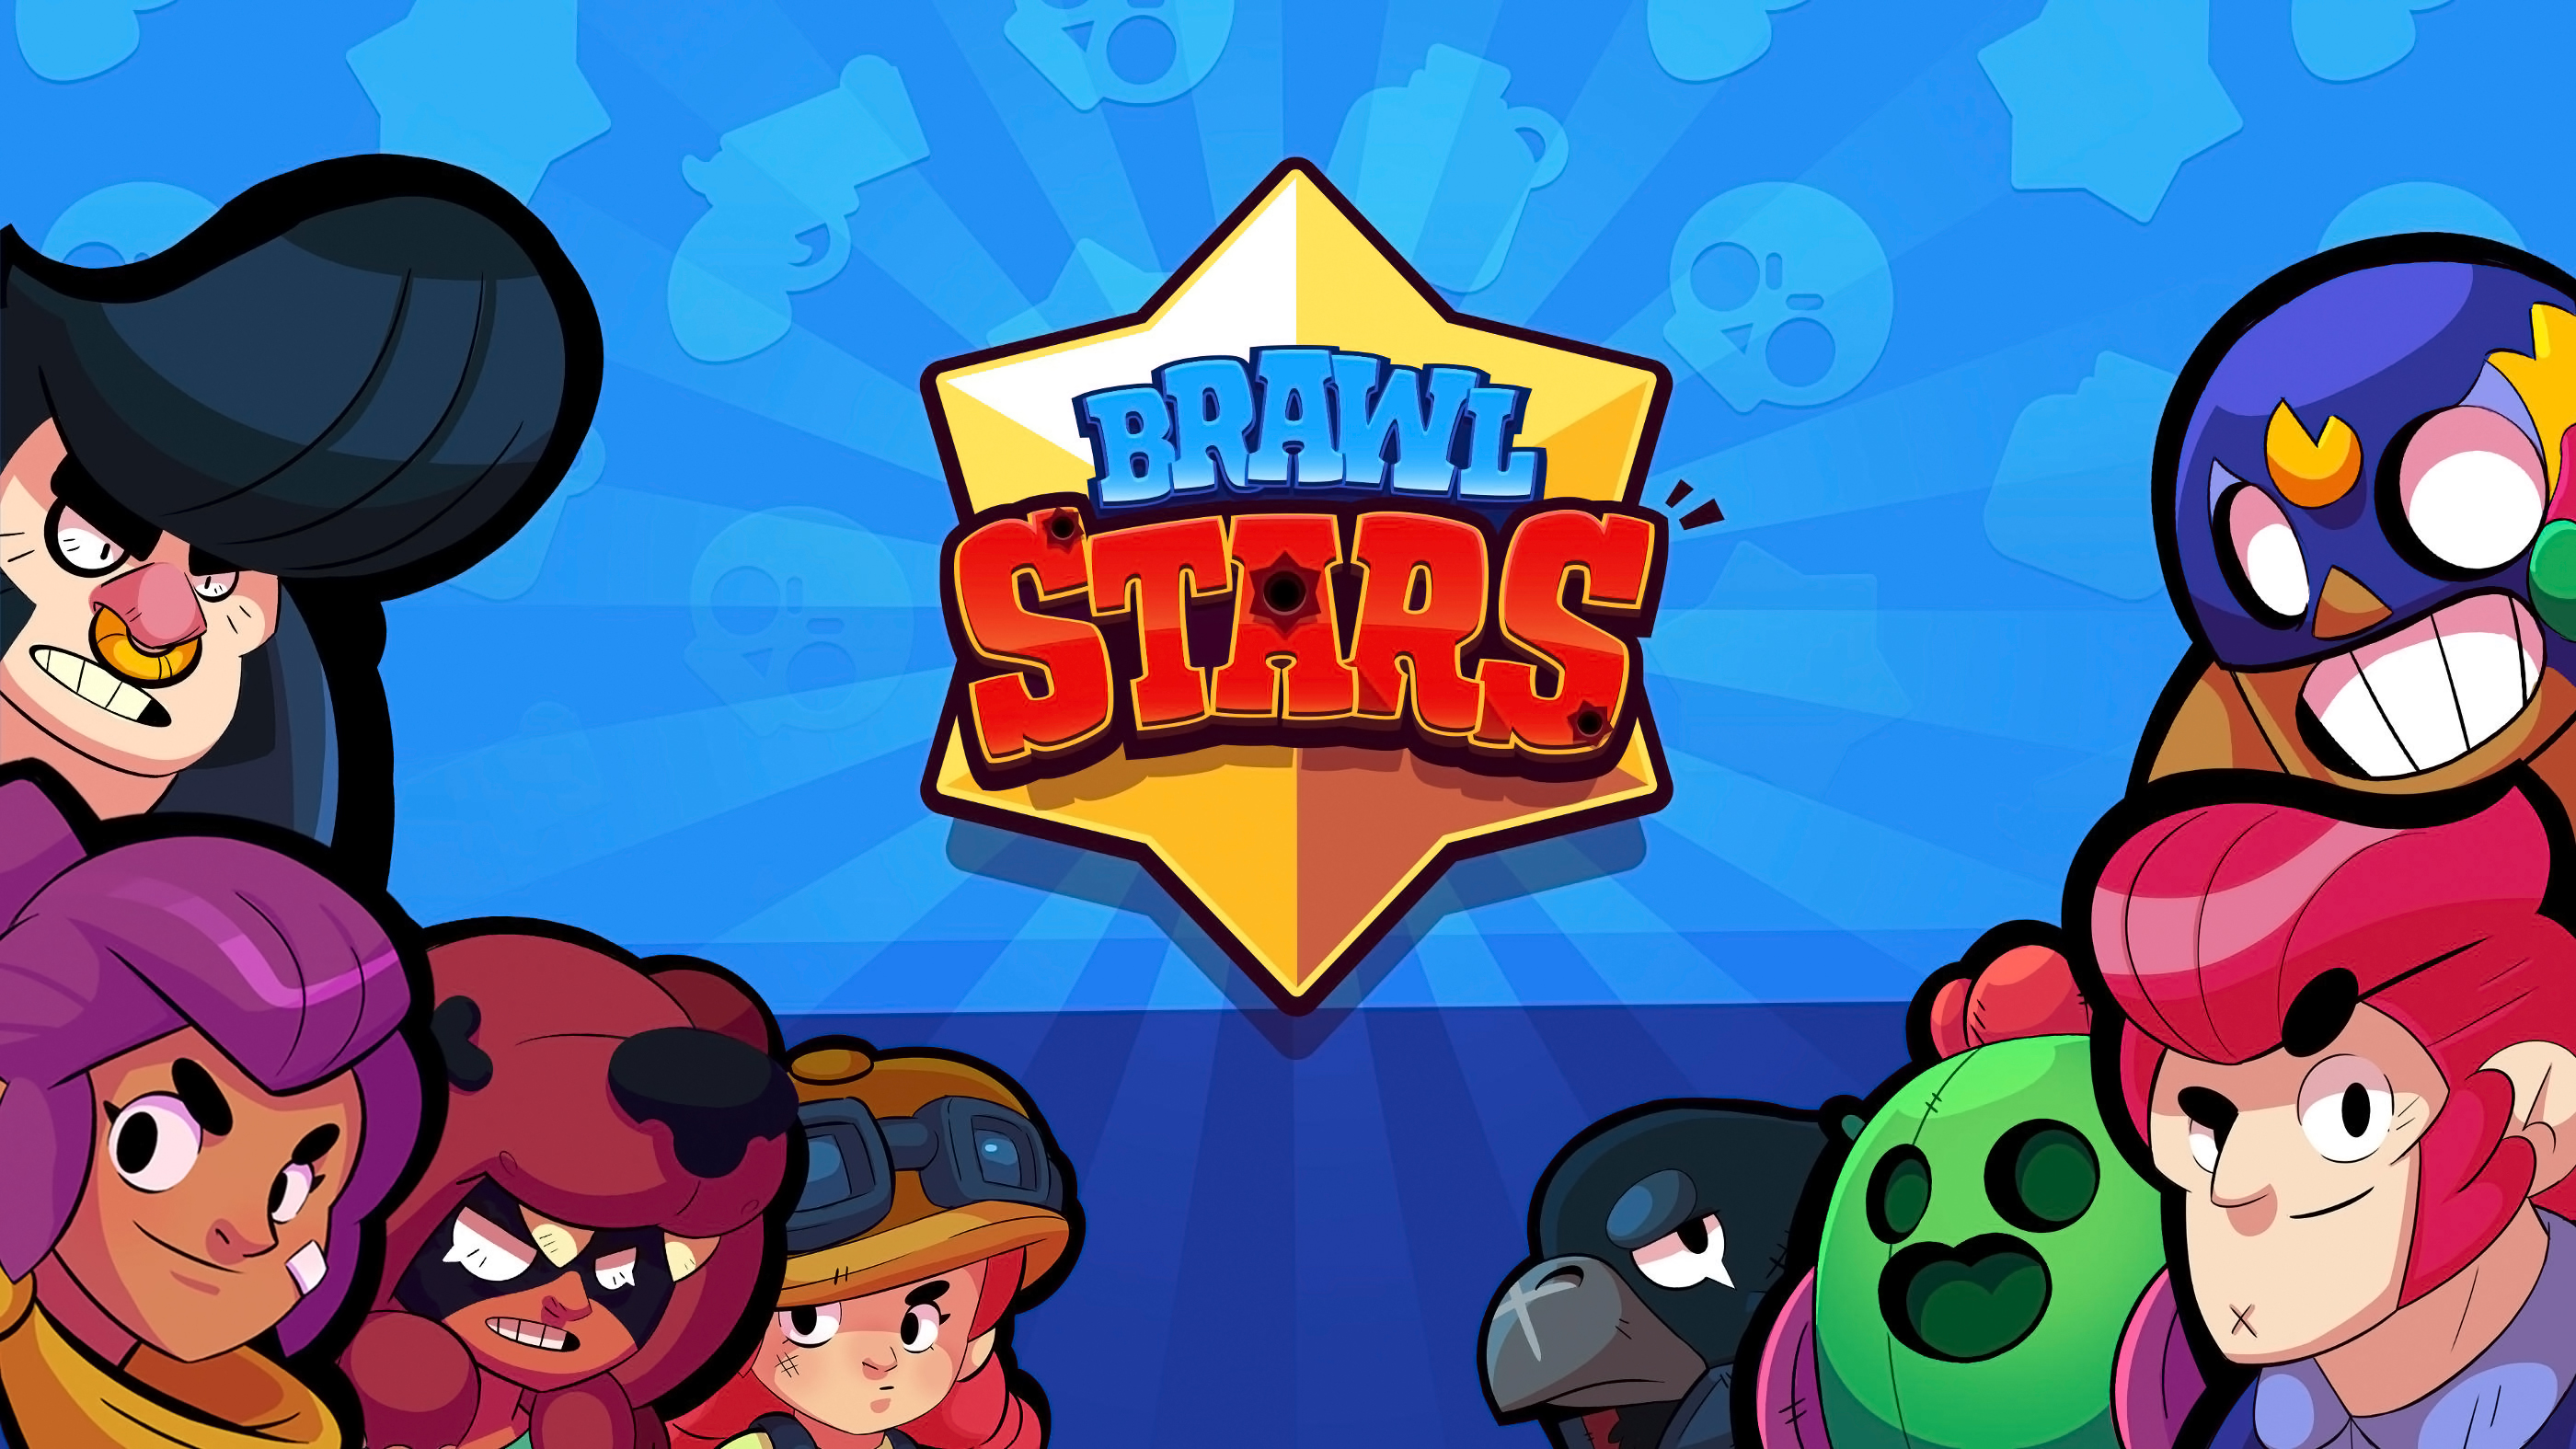 Fondos de pantalla Brawl Stars Logo y personajes